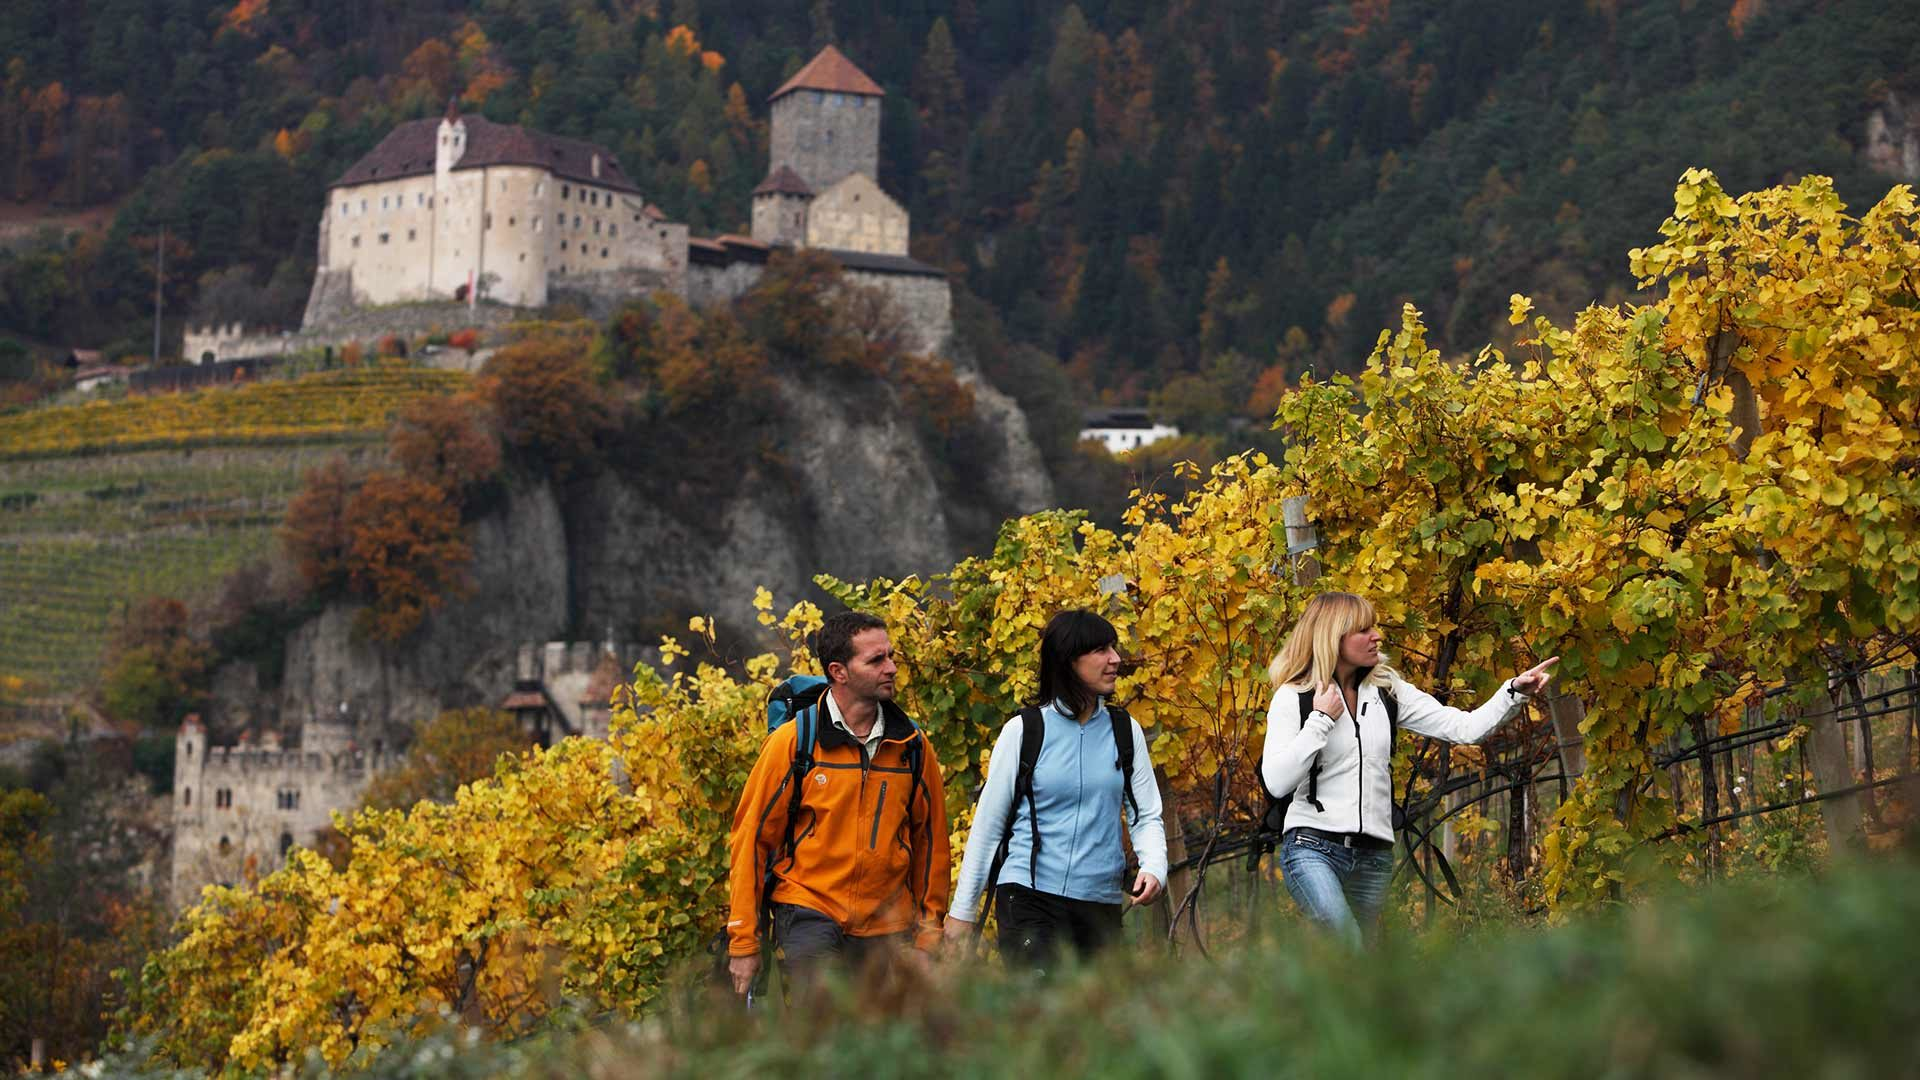 Merano - Gaveis - Val Sopranes - Tirolo - Merano